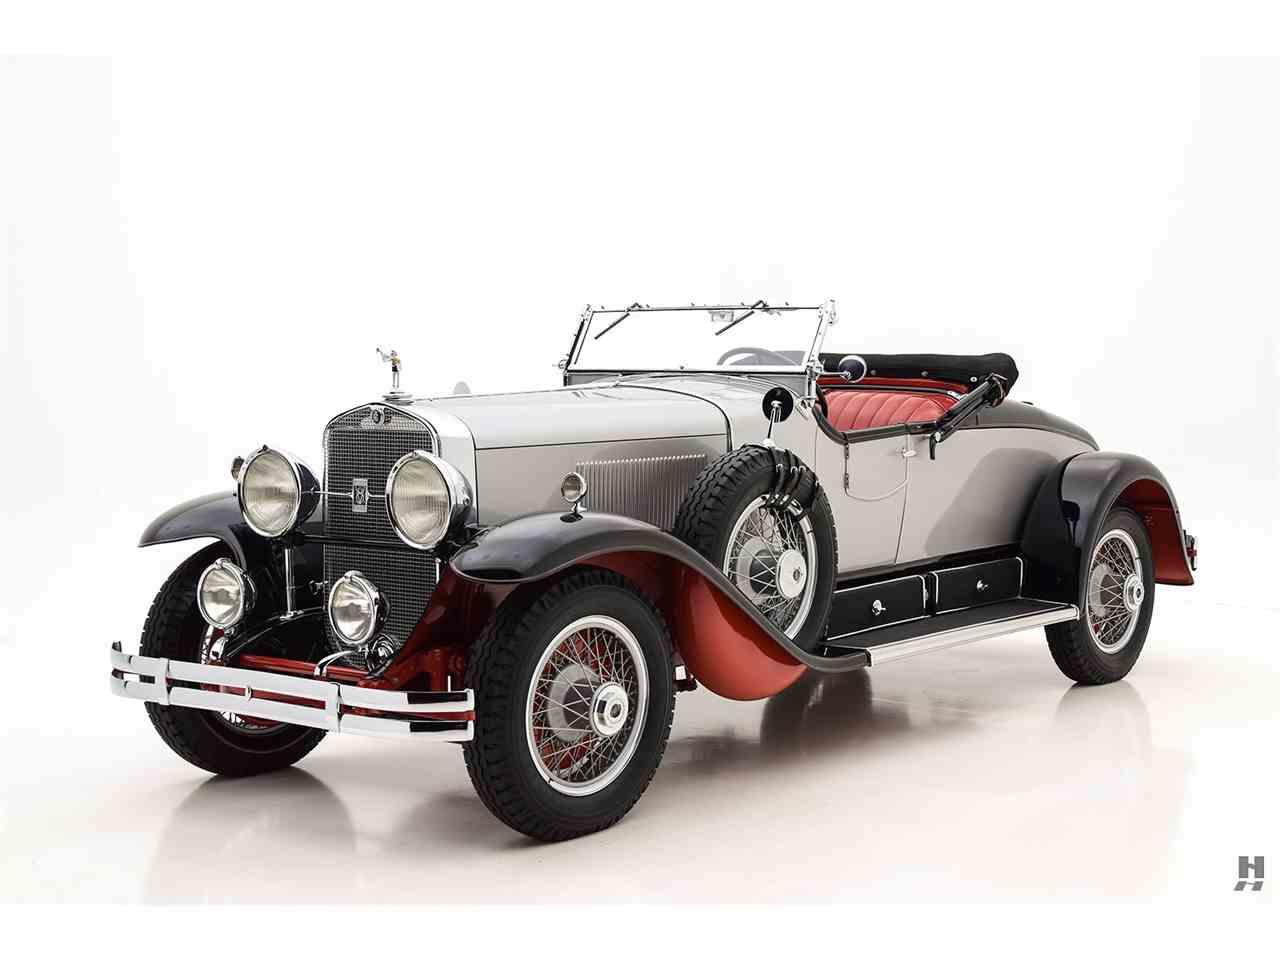 1929 Cadillac 341-B for Sale | ClassicCars.com | CC-1015110